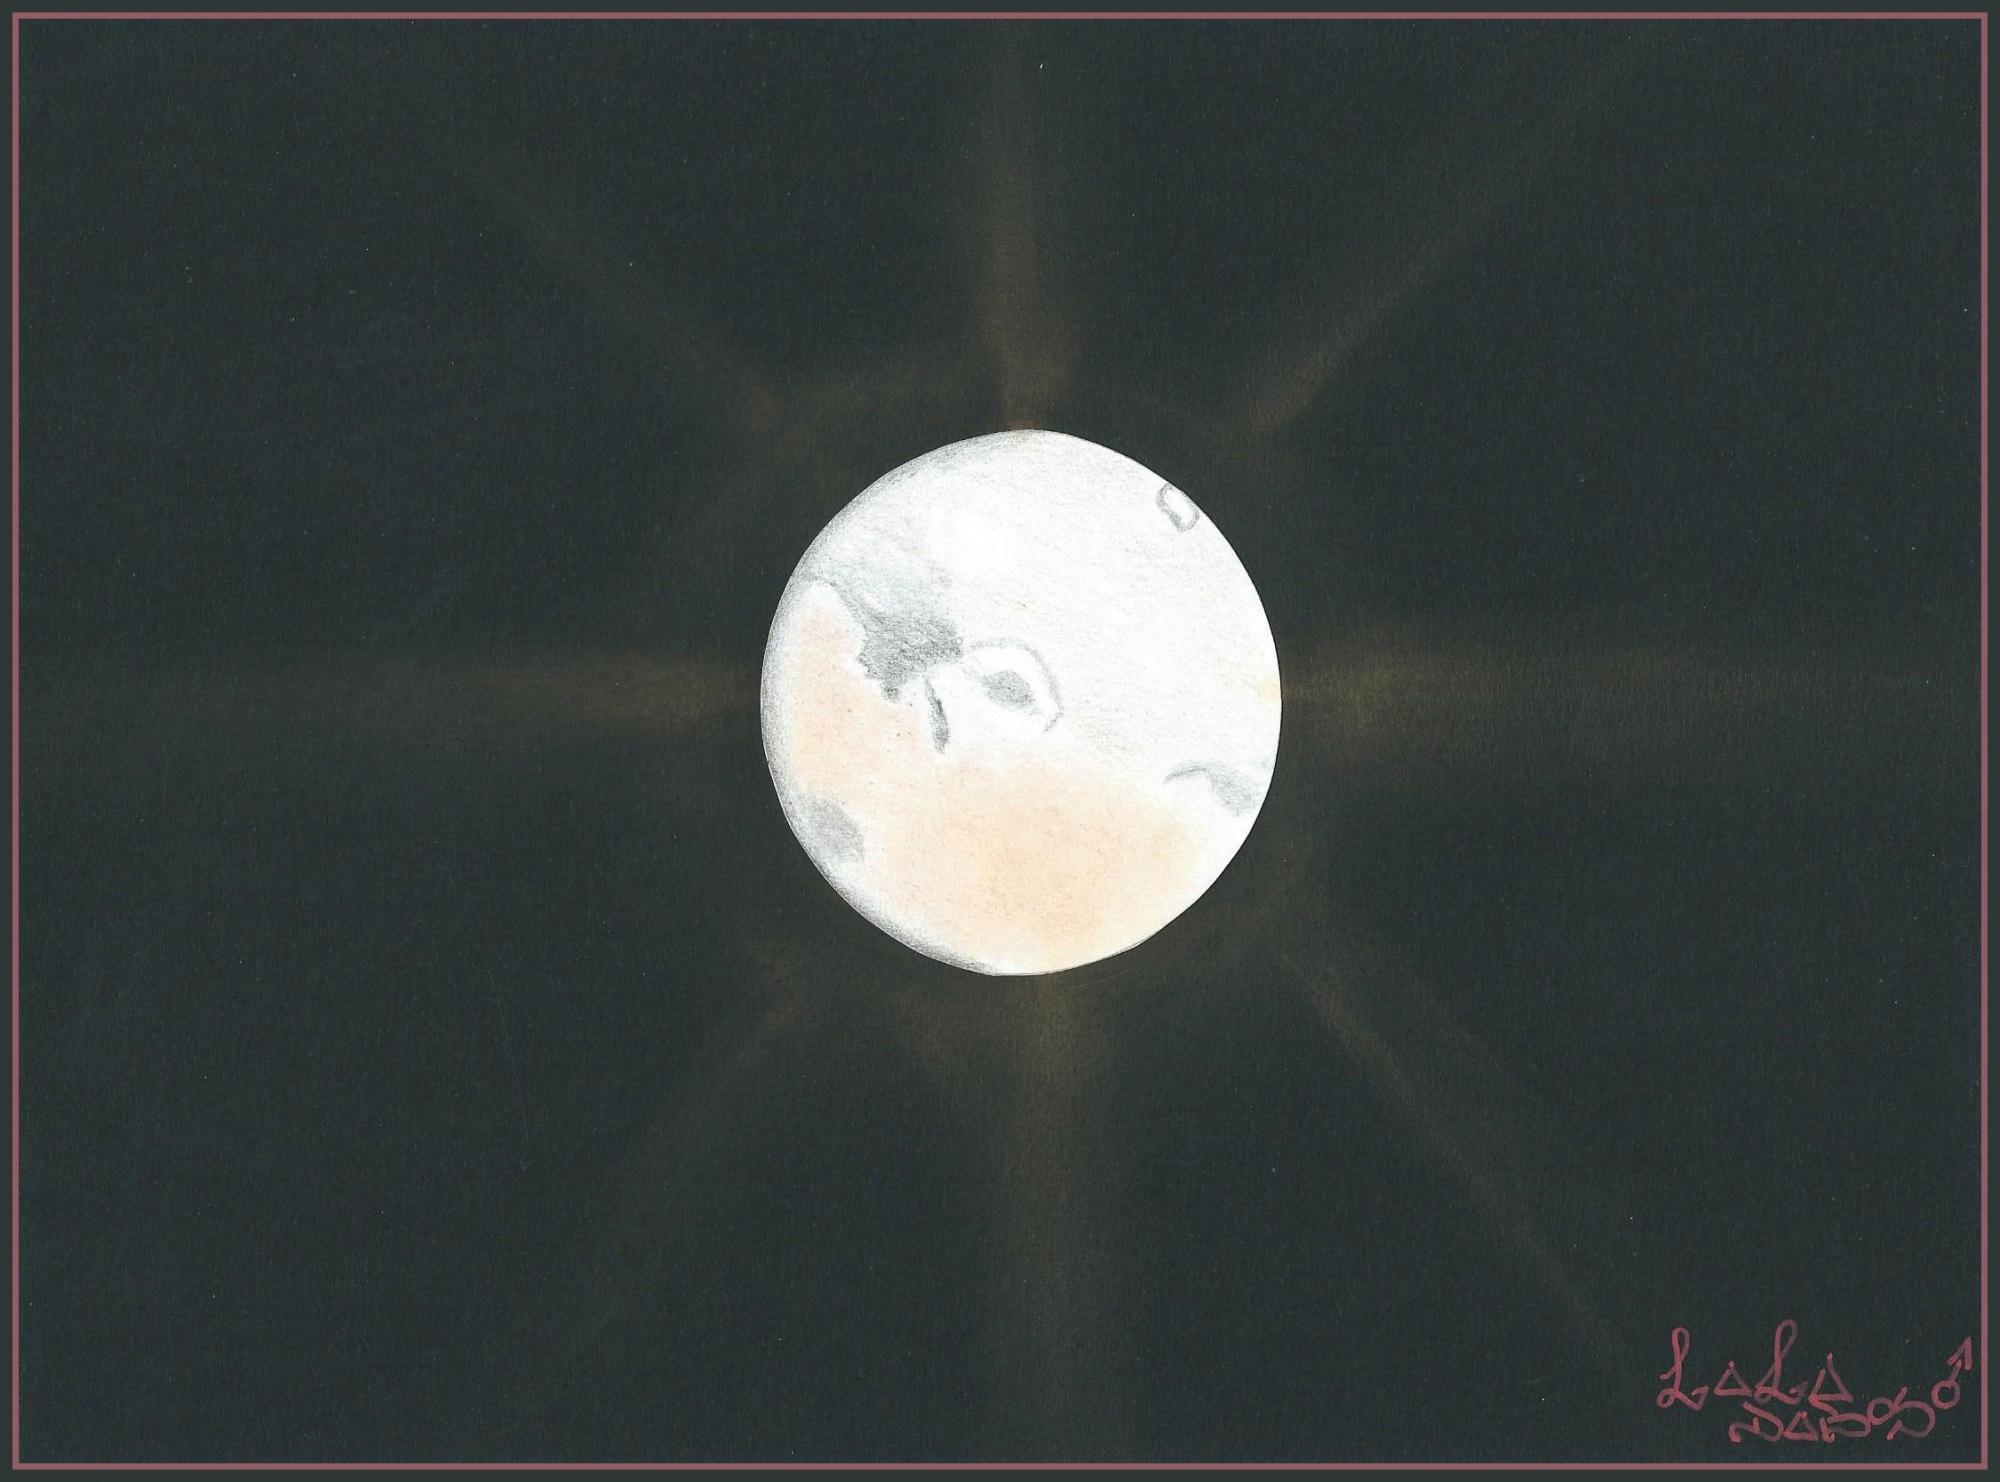 Mars18092020.thumb.jpg.18491d6e0044b36d24cbab295c9fc534.jpg